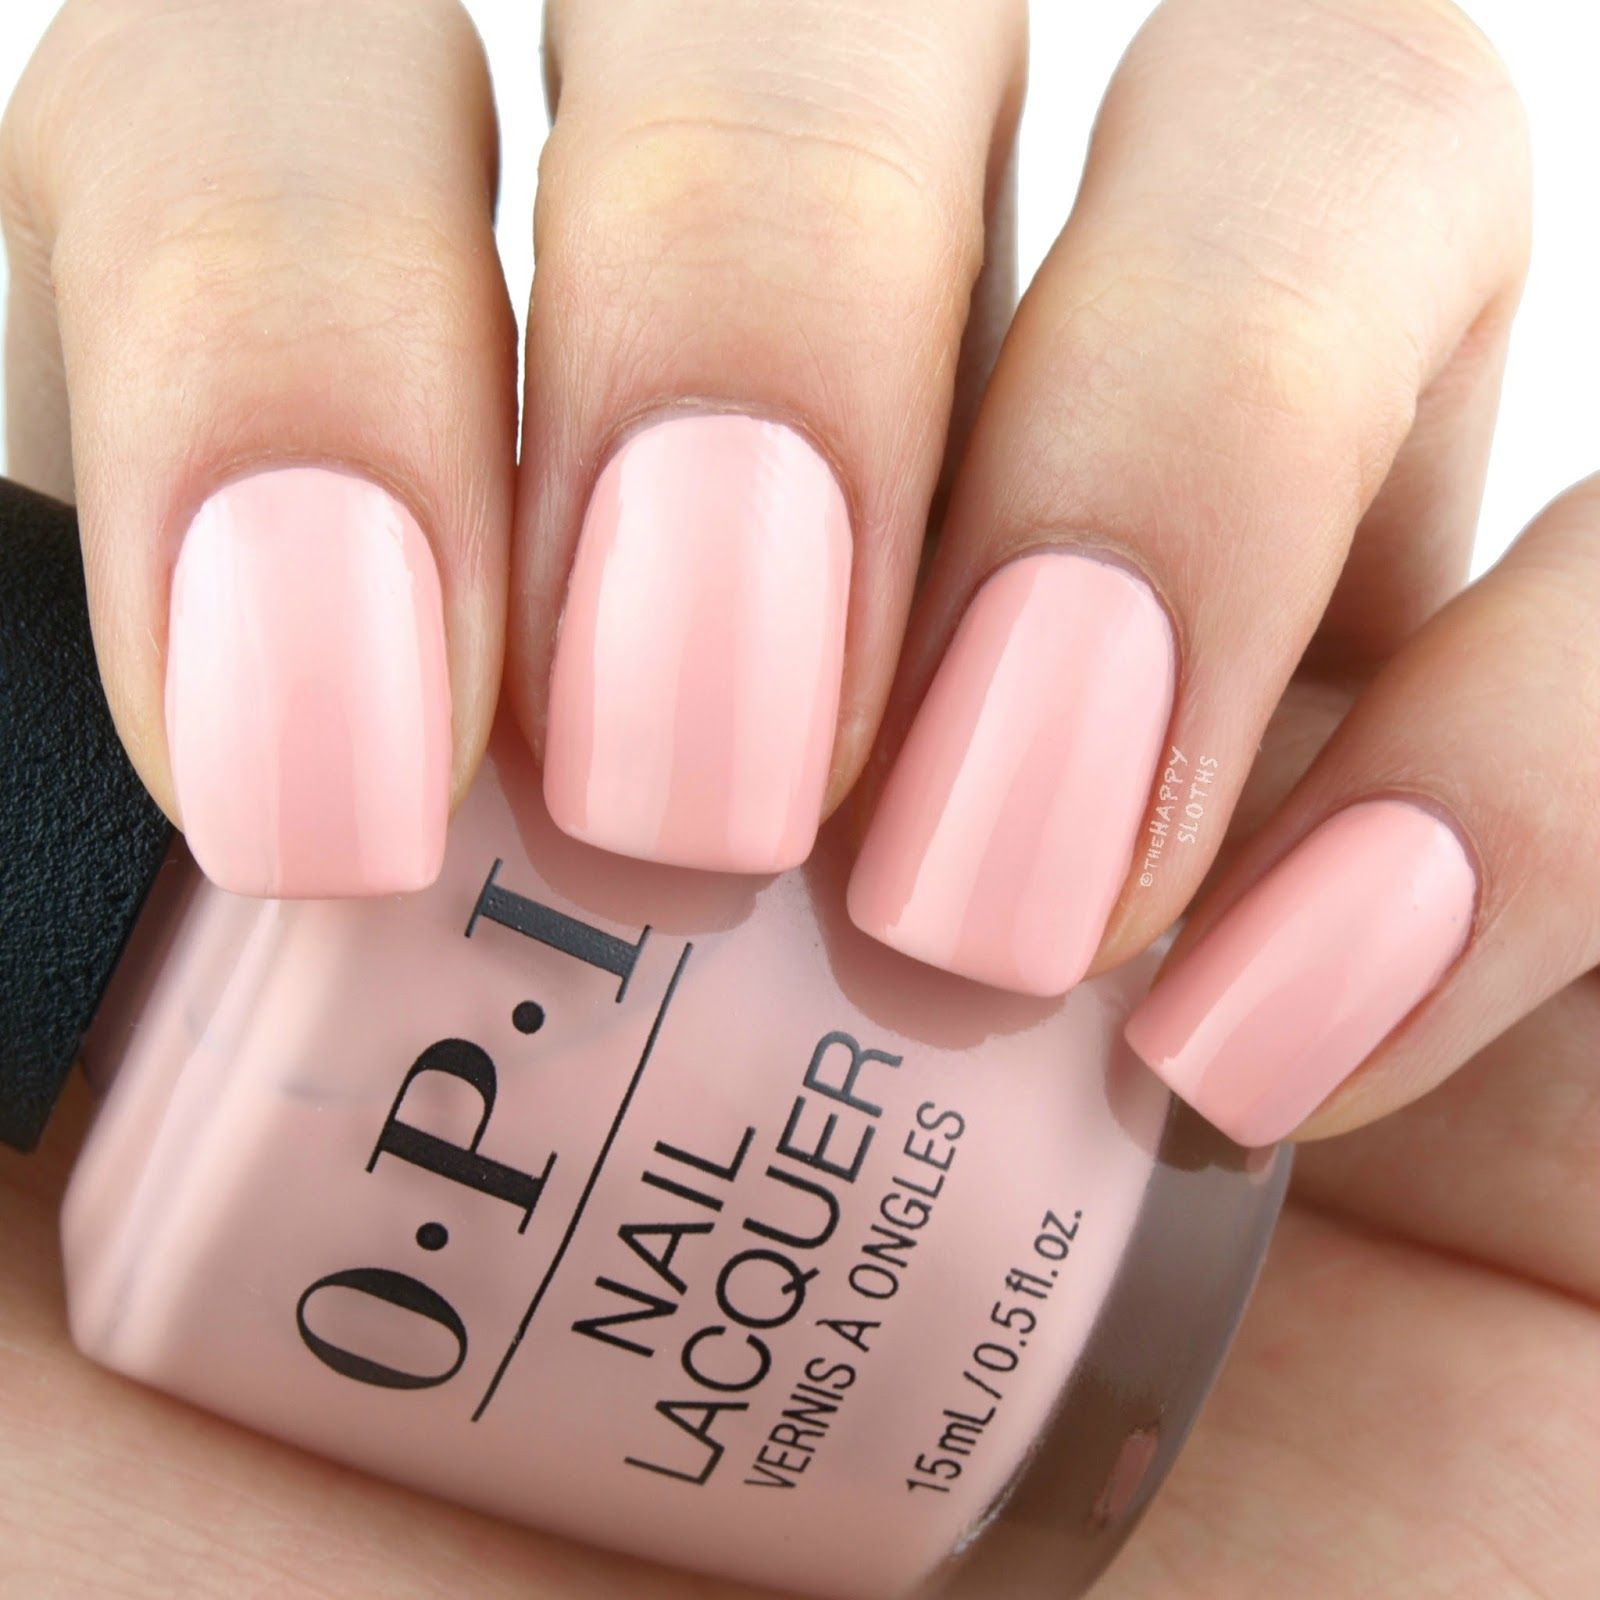 Opi Summer 2018 Grease Collection Review And Swatches Work Nails Opi Nail Polish Colors Opi Nail Colors